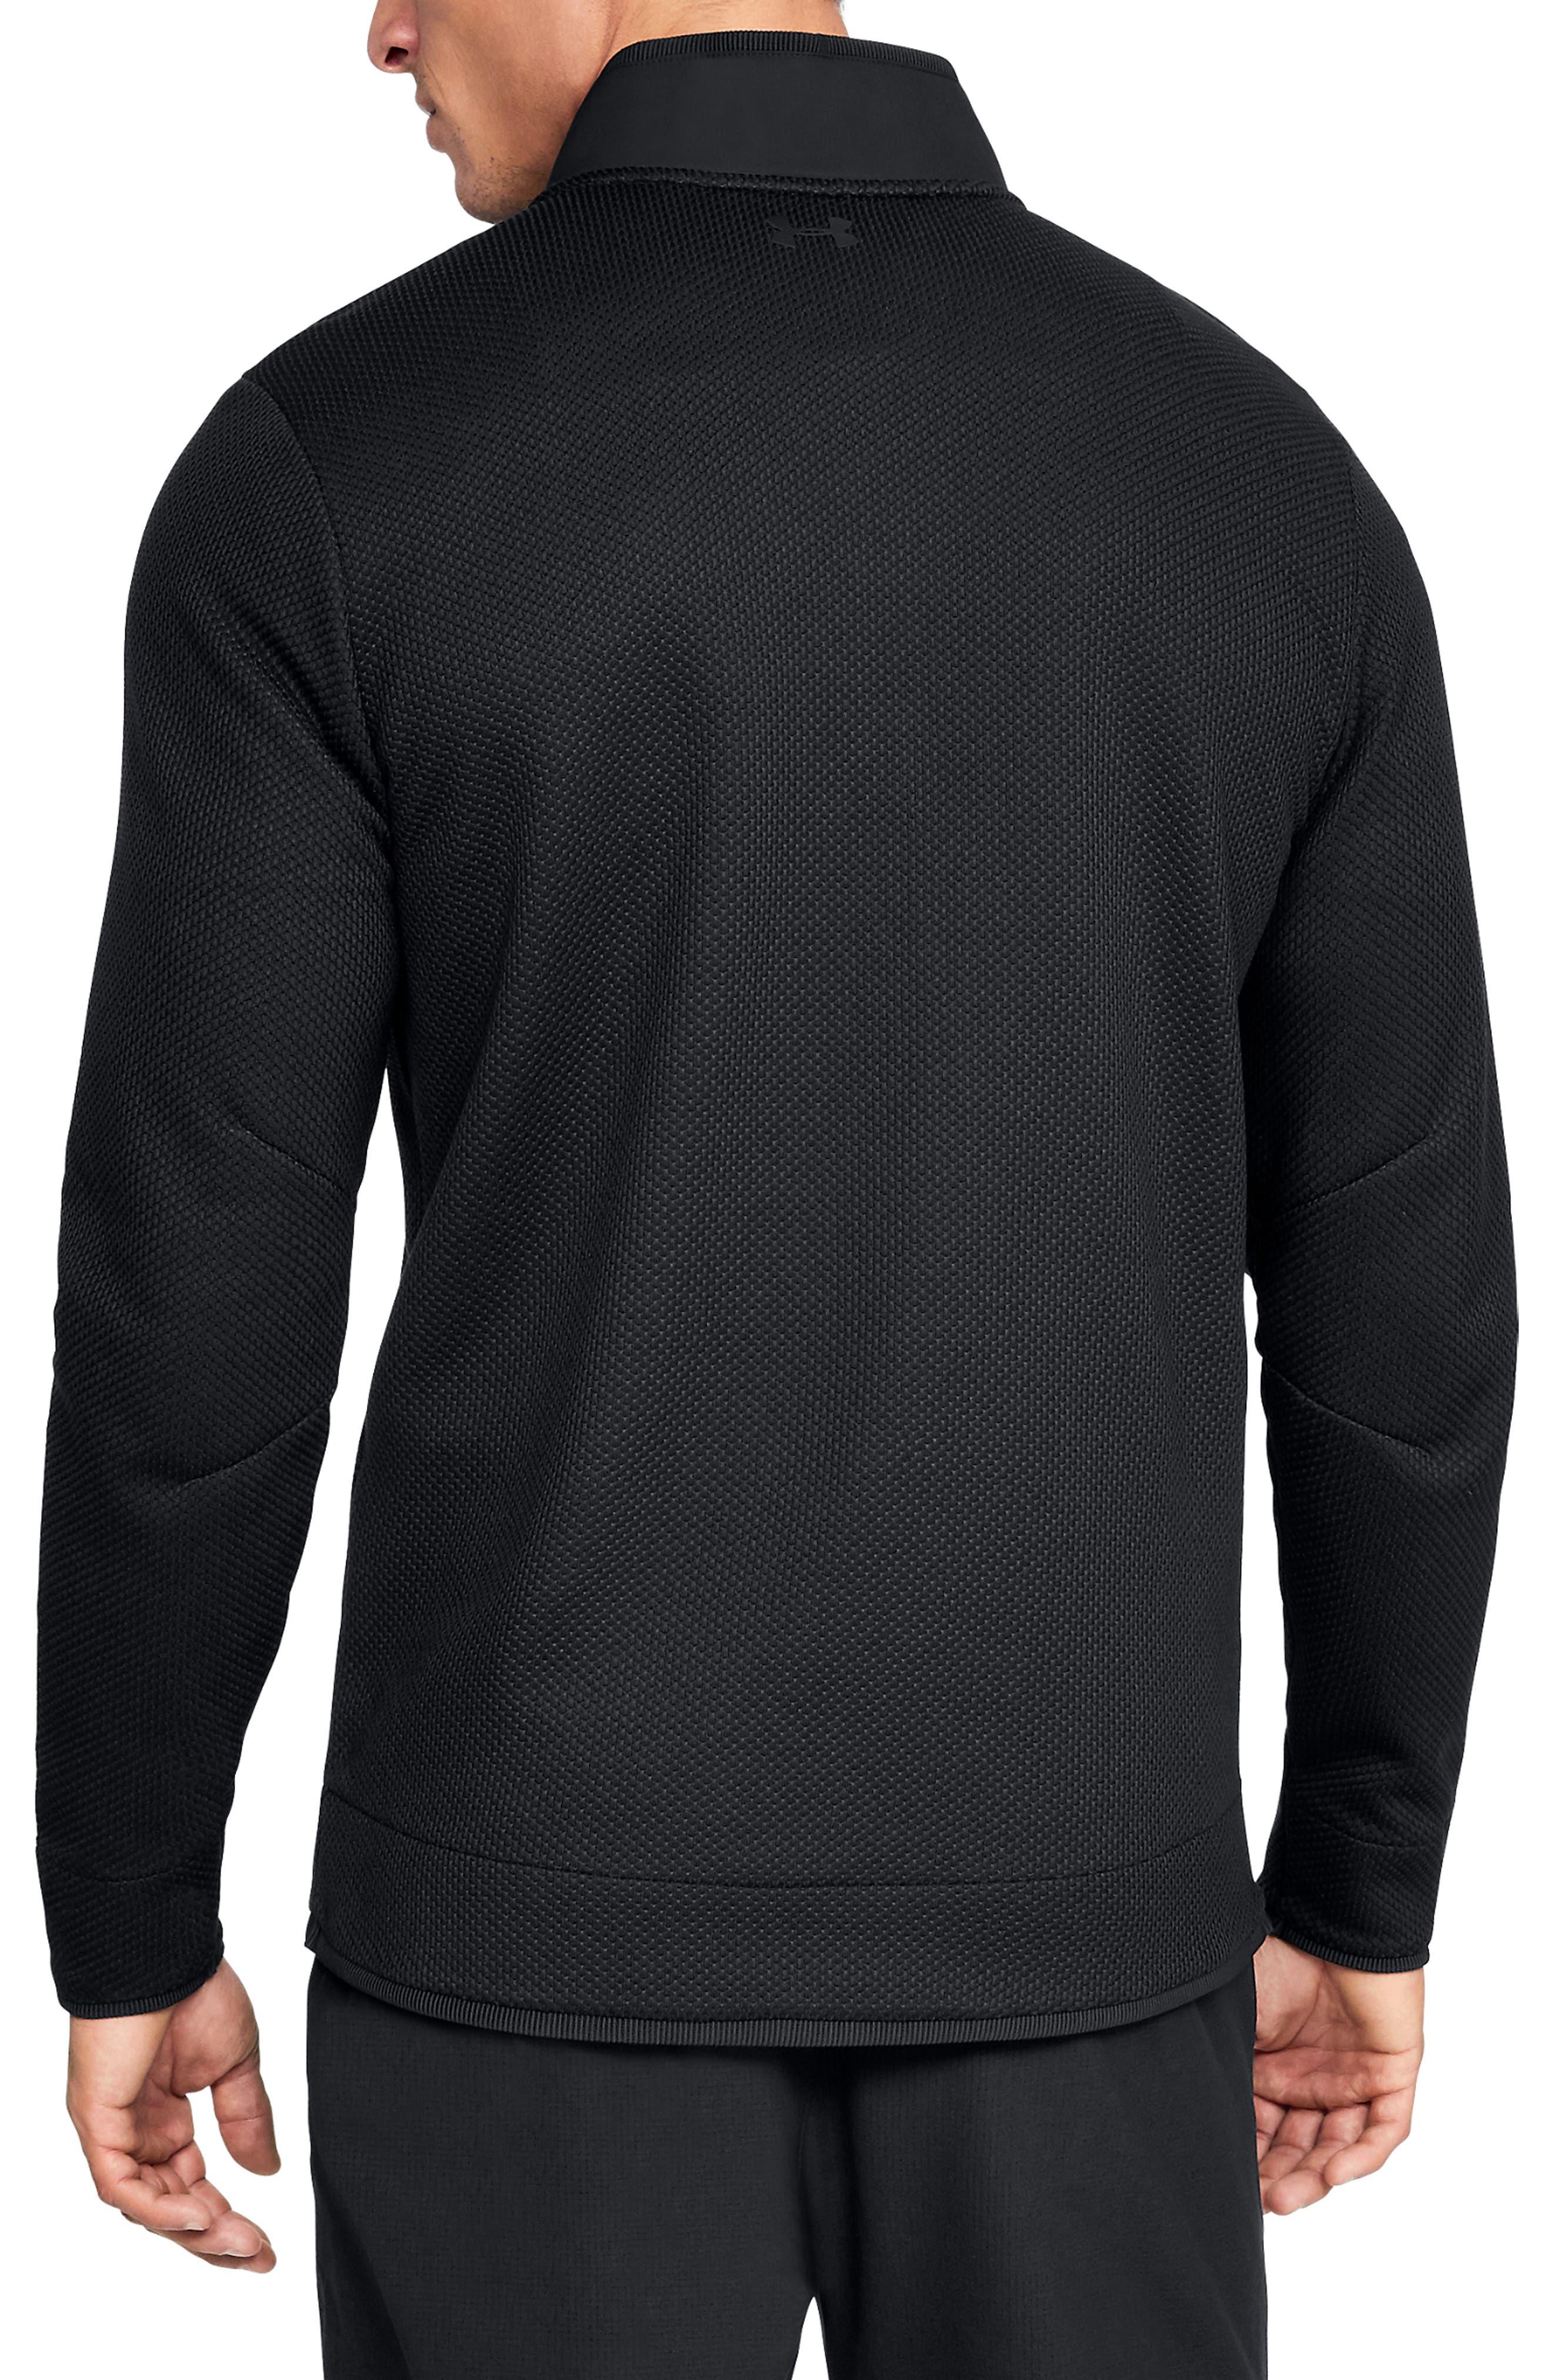 UNDER ARMOUR, Storm SweaterFleece Snap Mock Neck Pullover, Alternate thumbnail 2, color, BLACK/ BLACK/ BLACK